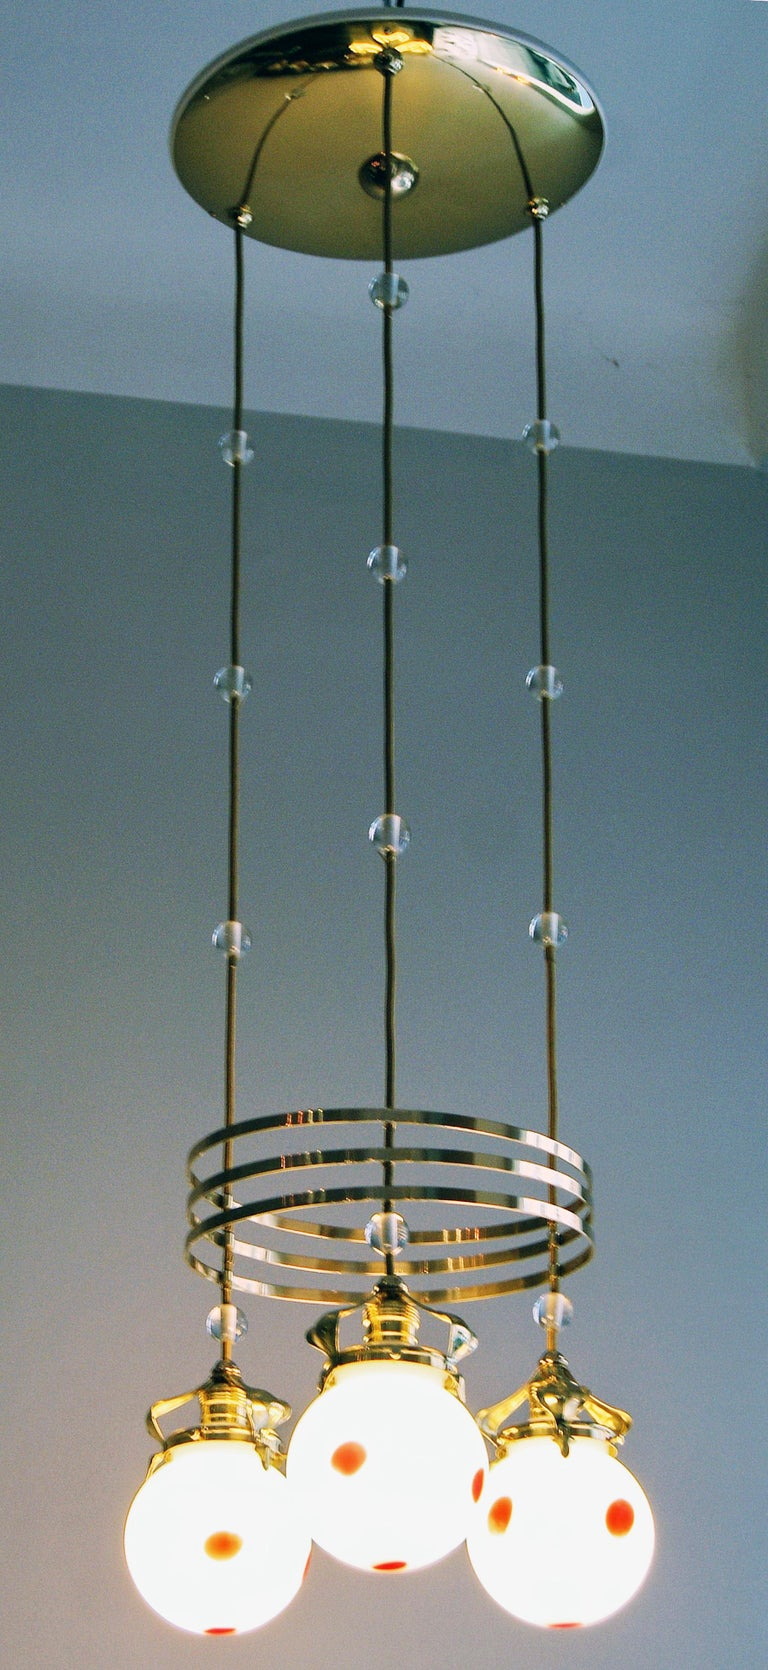 Art Nouveau Ceiling Lamp Chandelier Design Kolo Moser by Bakalowits, Vienna 1910 For Sale 4